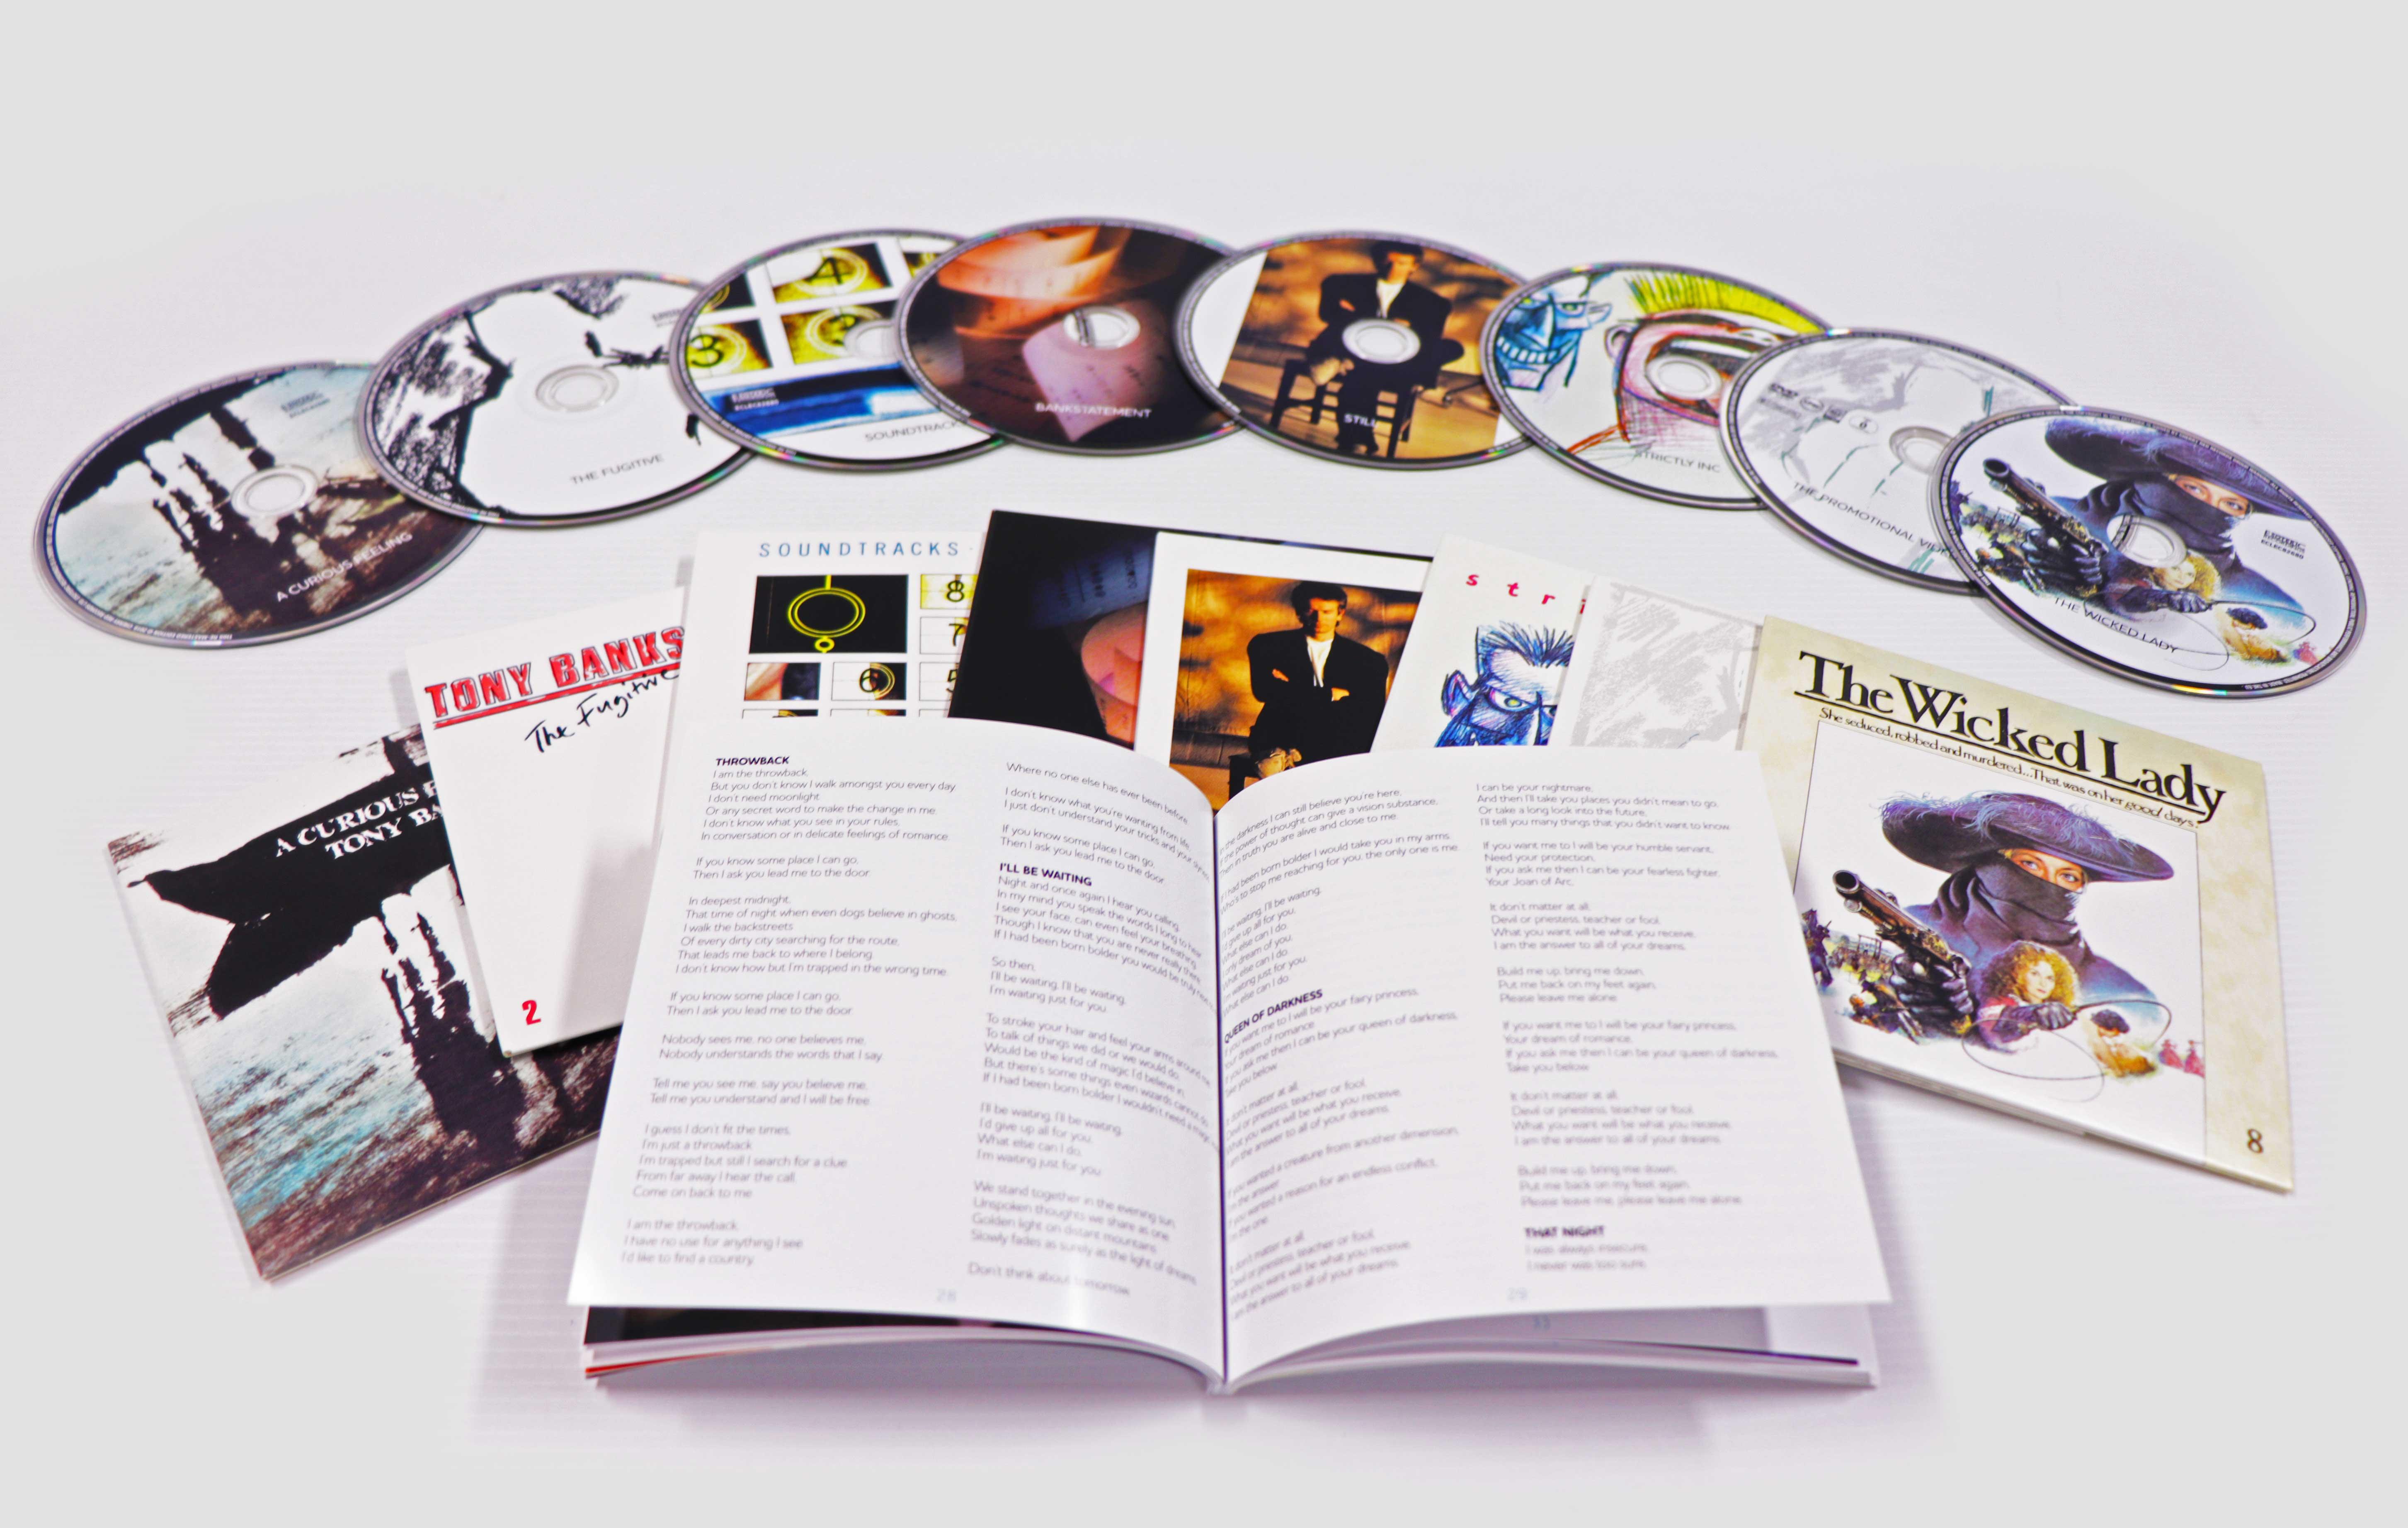 Tony Banks: Banks Vaults: The Albums 1979 - 1995, 8 Disc (7CD/1DVD) Boxset